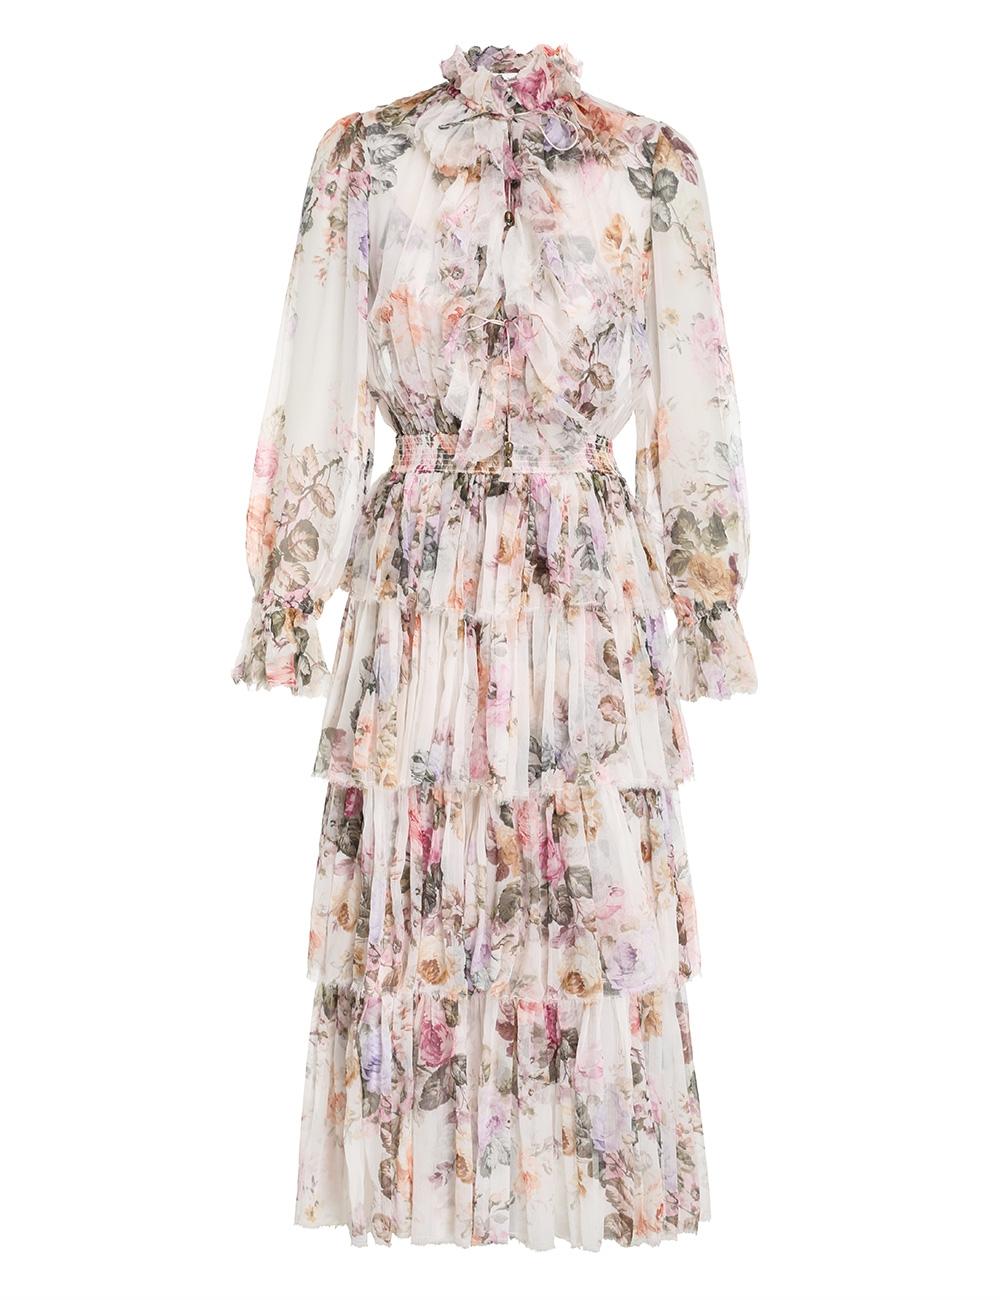 Brighton Tiered Frill Dress